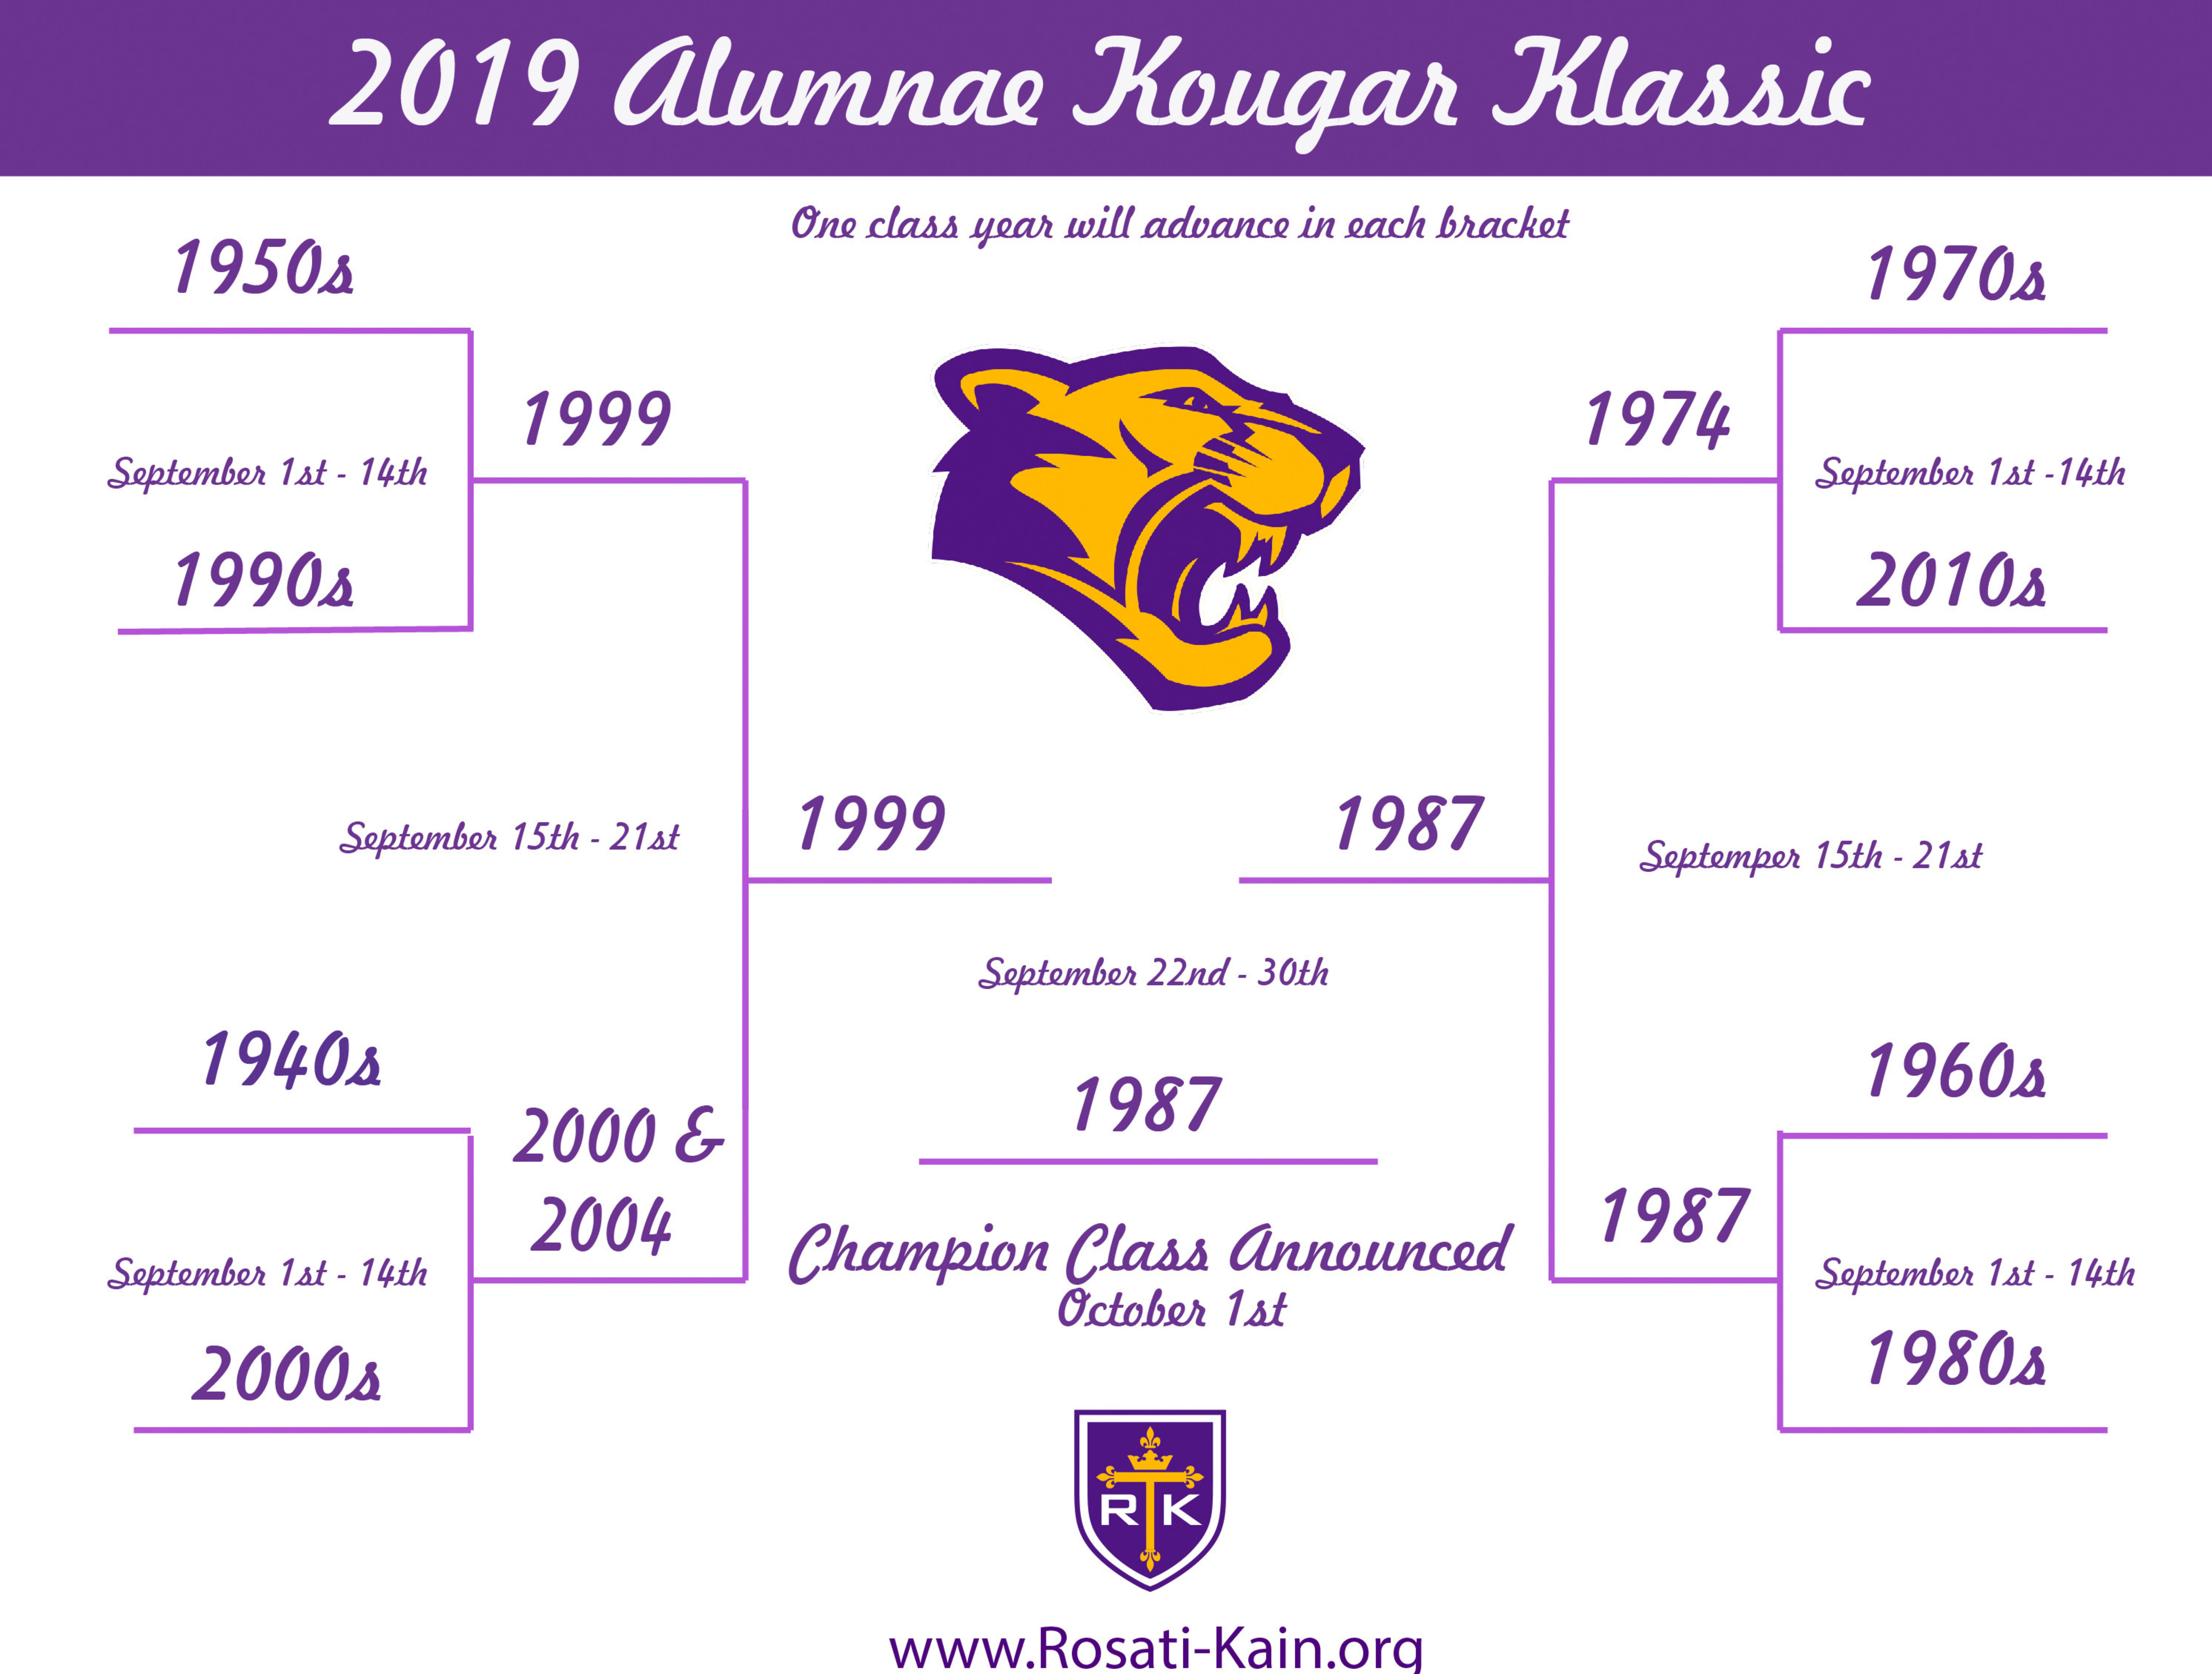 1 Kougar Klassic Bracket 2019 Final